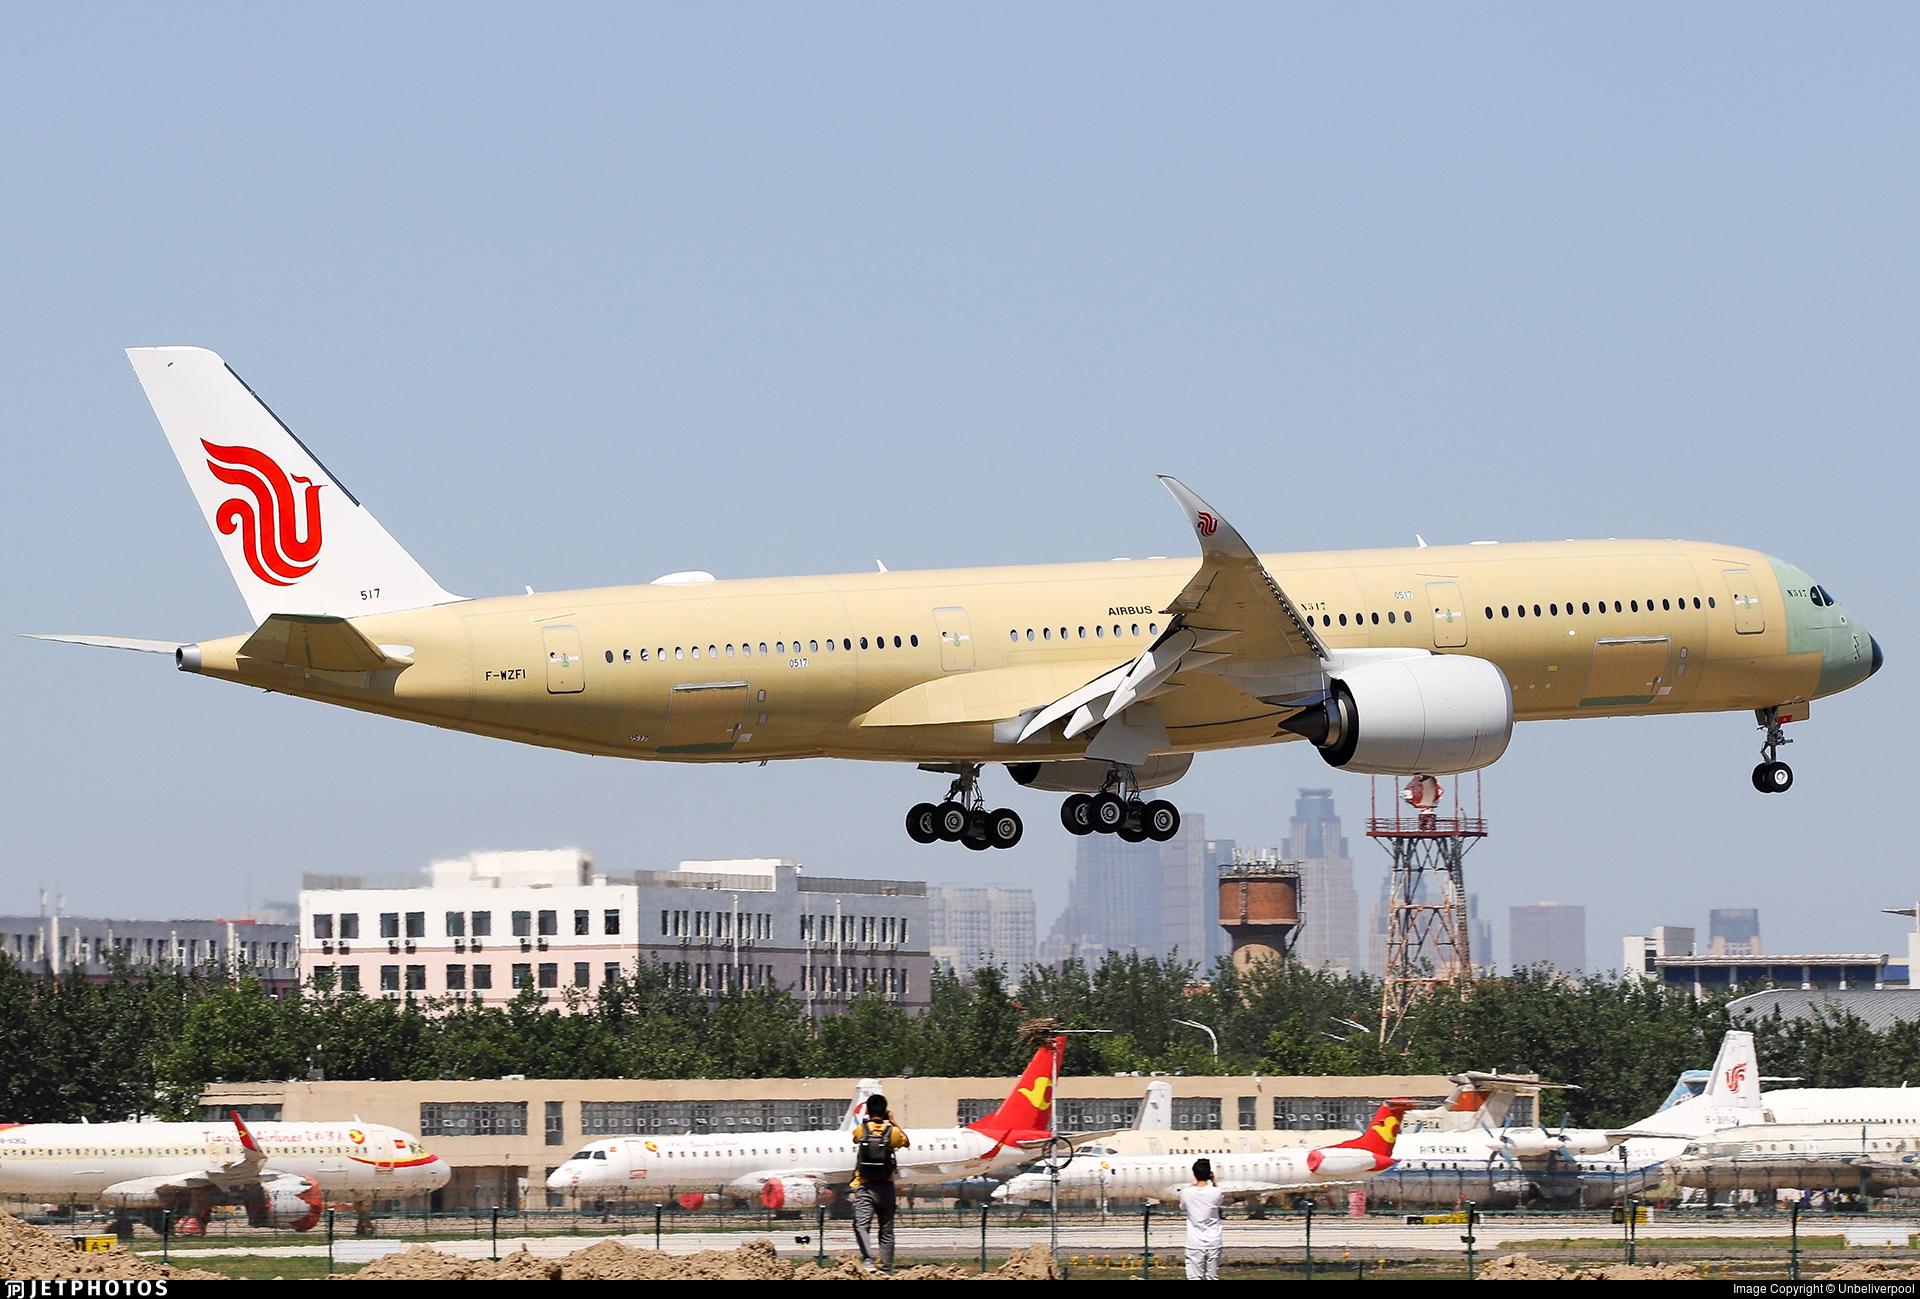 F-WZFI - Airbus A350-941 - Airbus Industrie